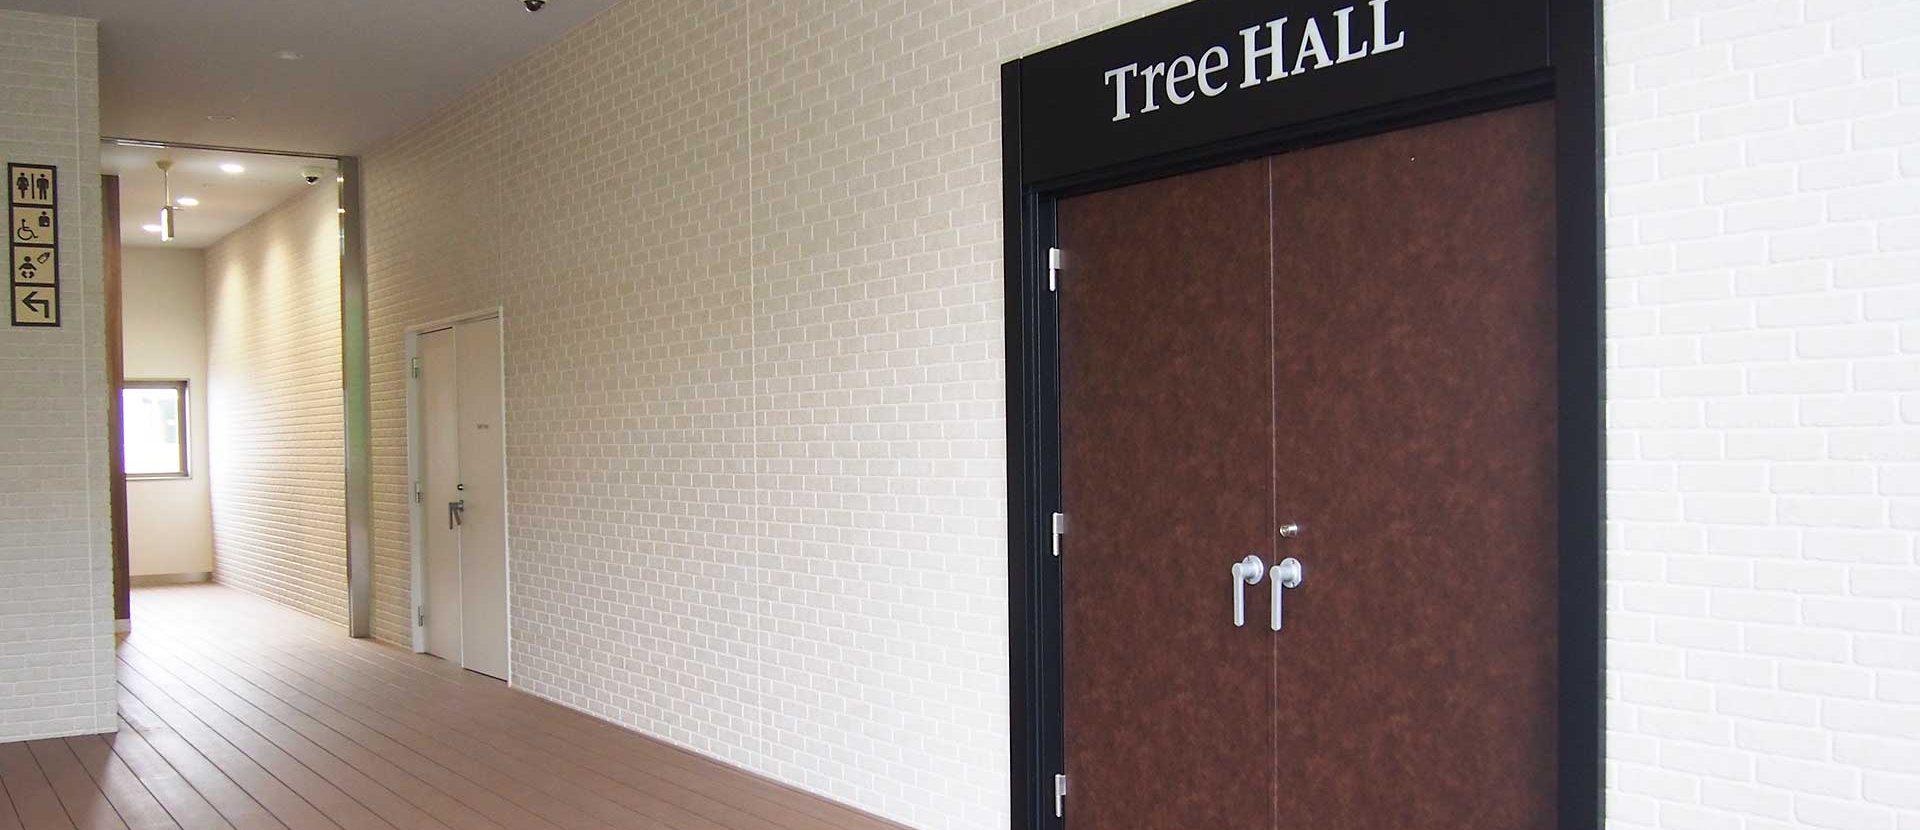 Tree HALLホール入り口